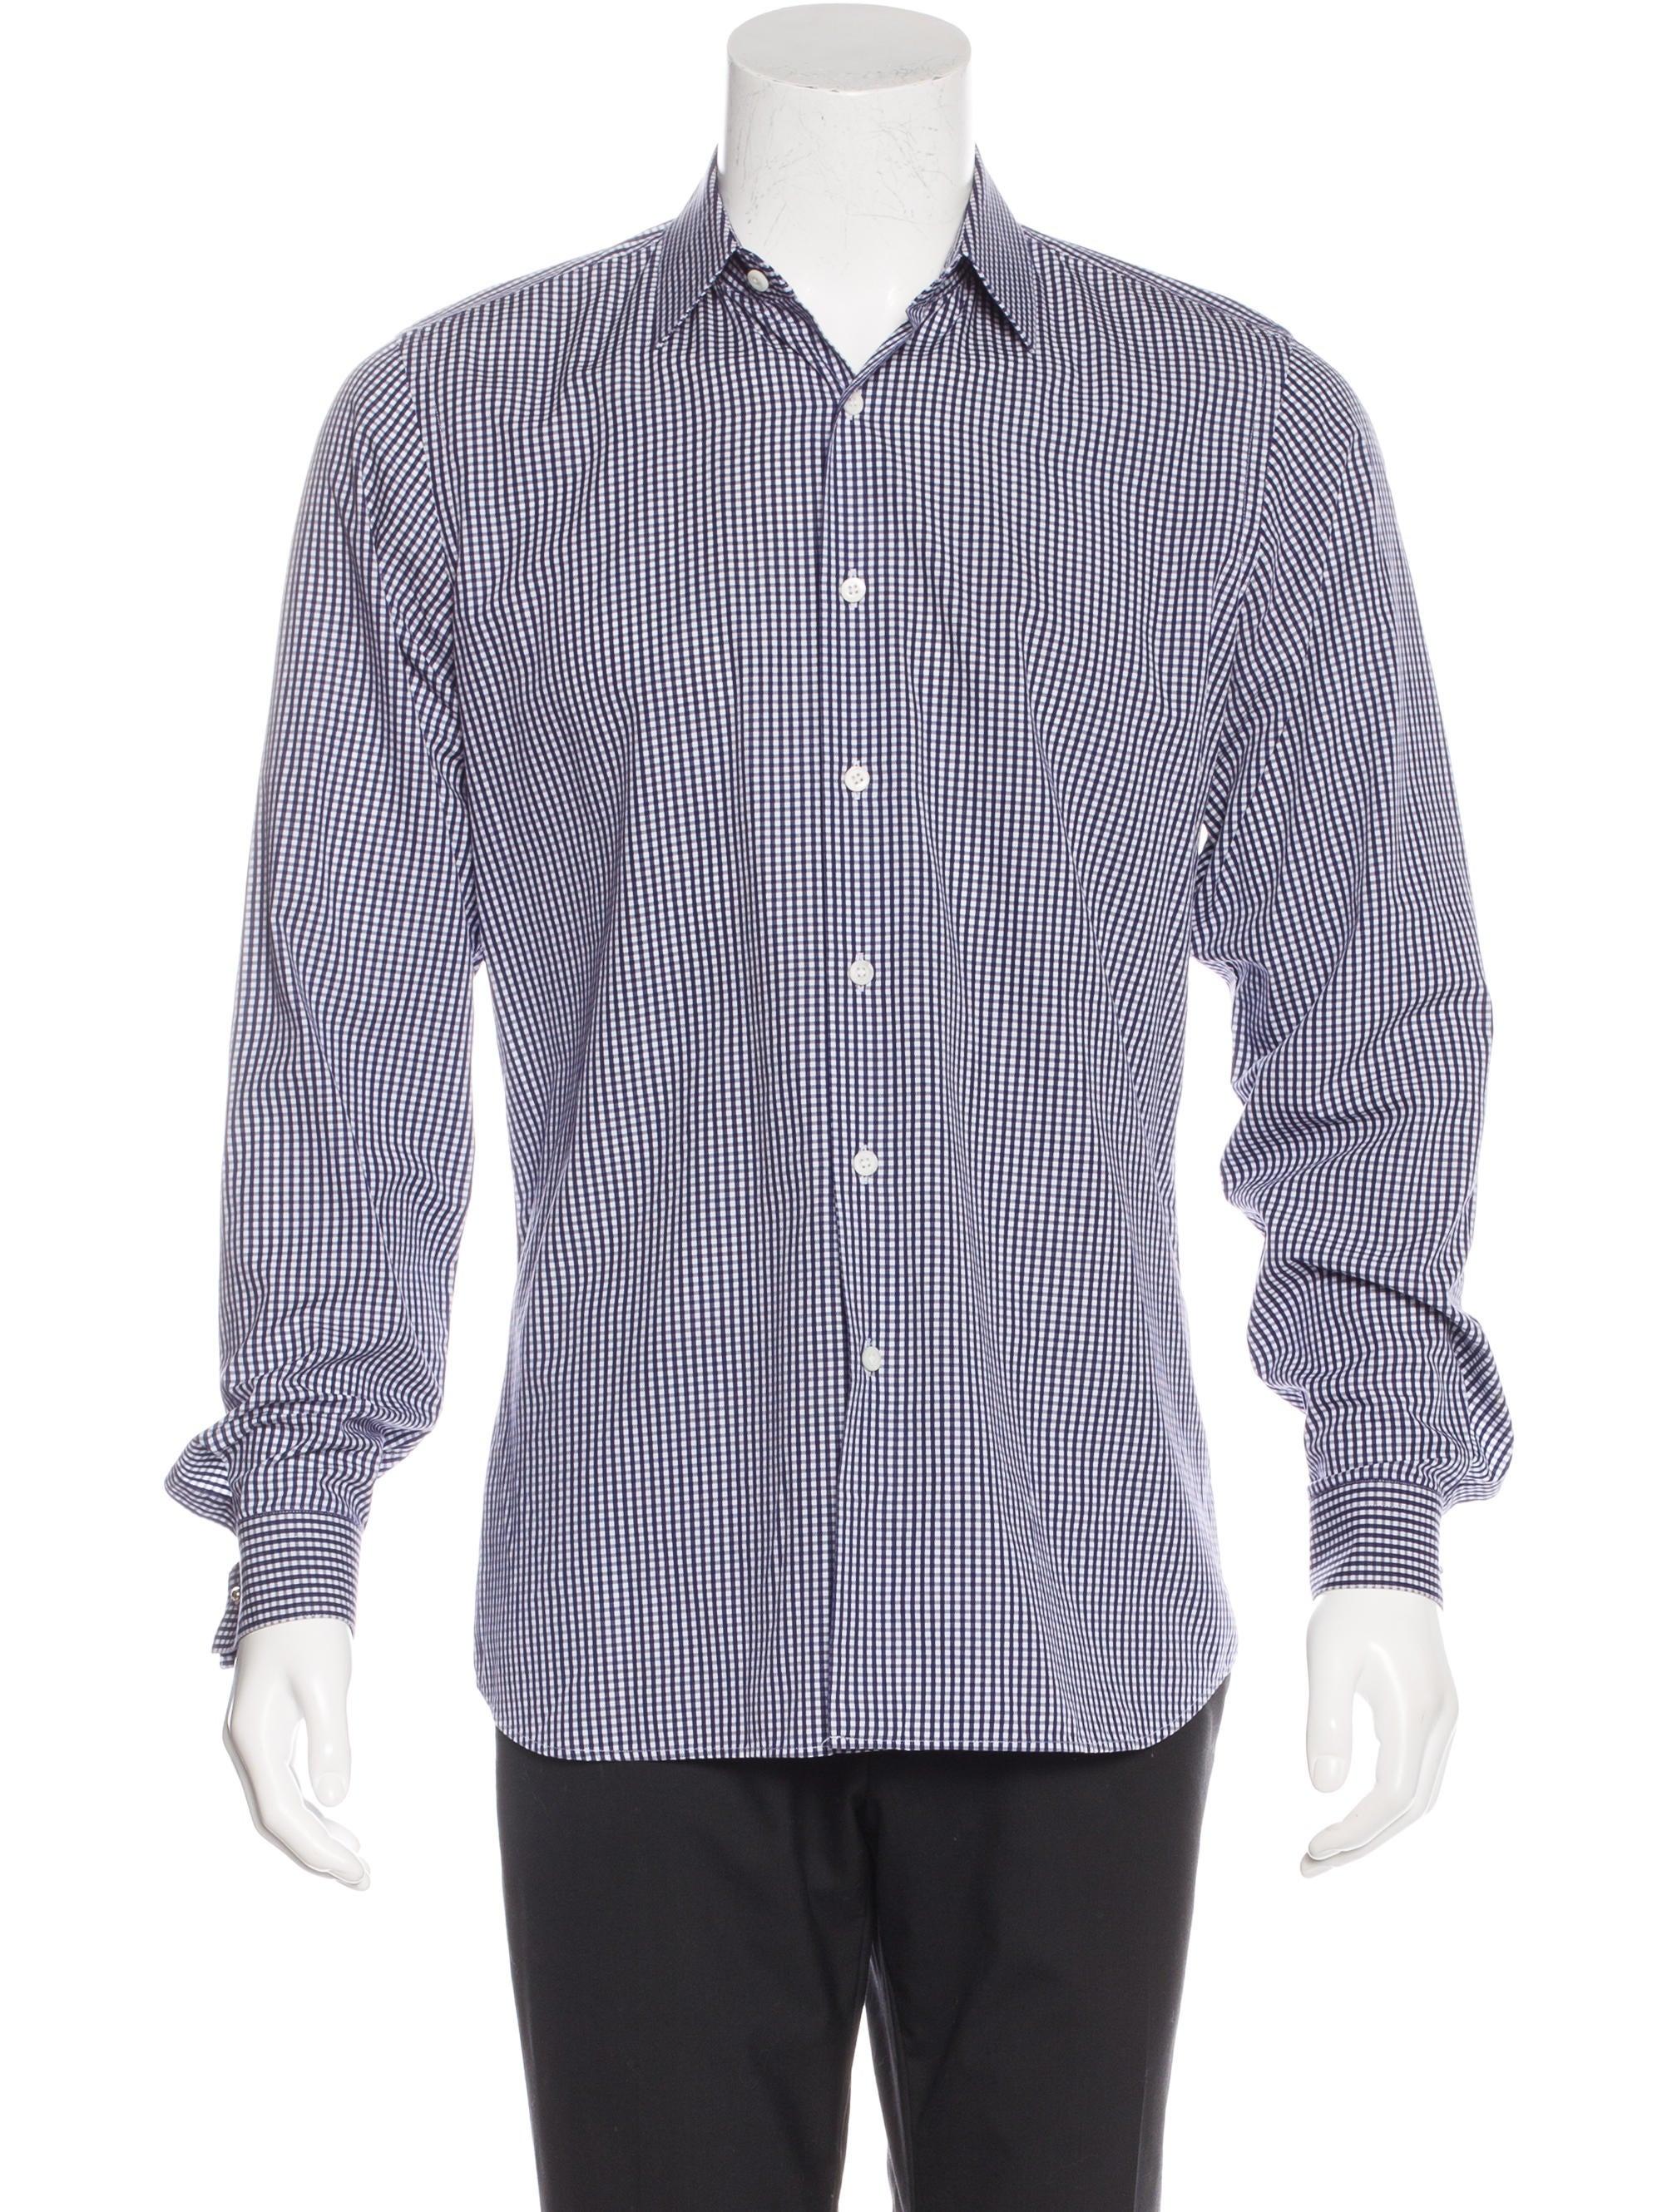 Prada gingham dress shirt clothing pra133591 the for Gingham dress shirt men